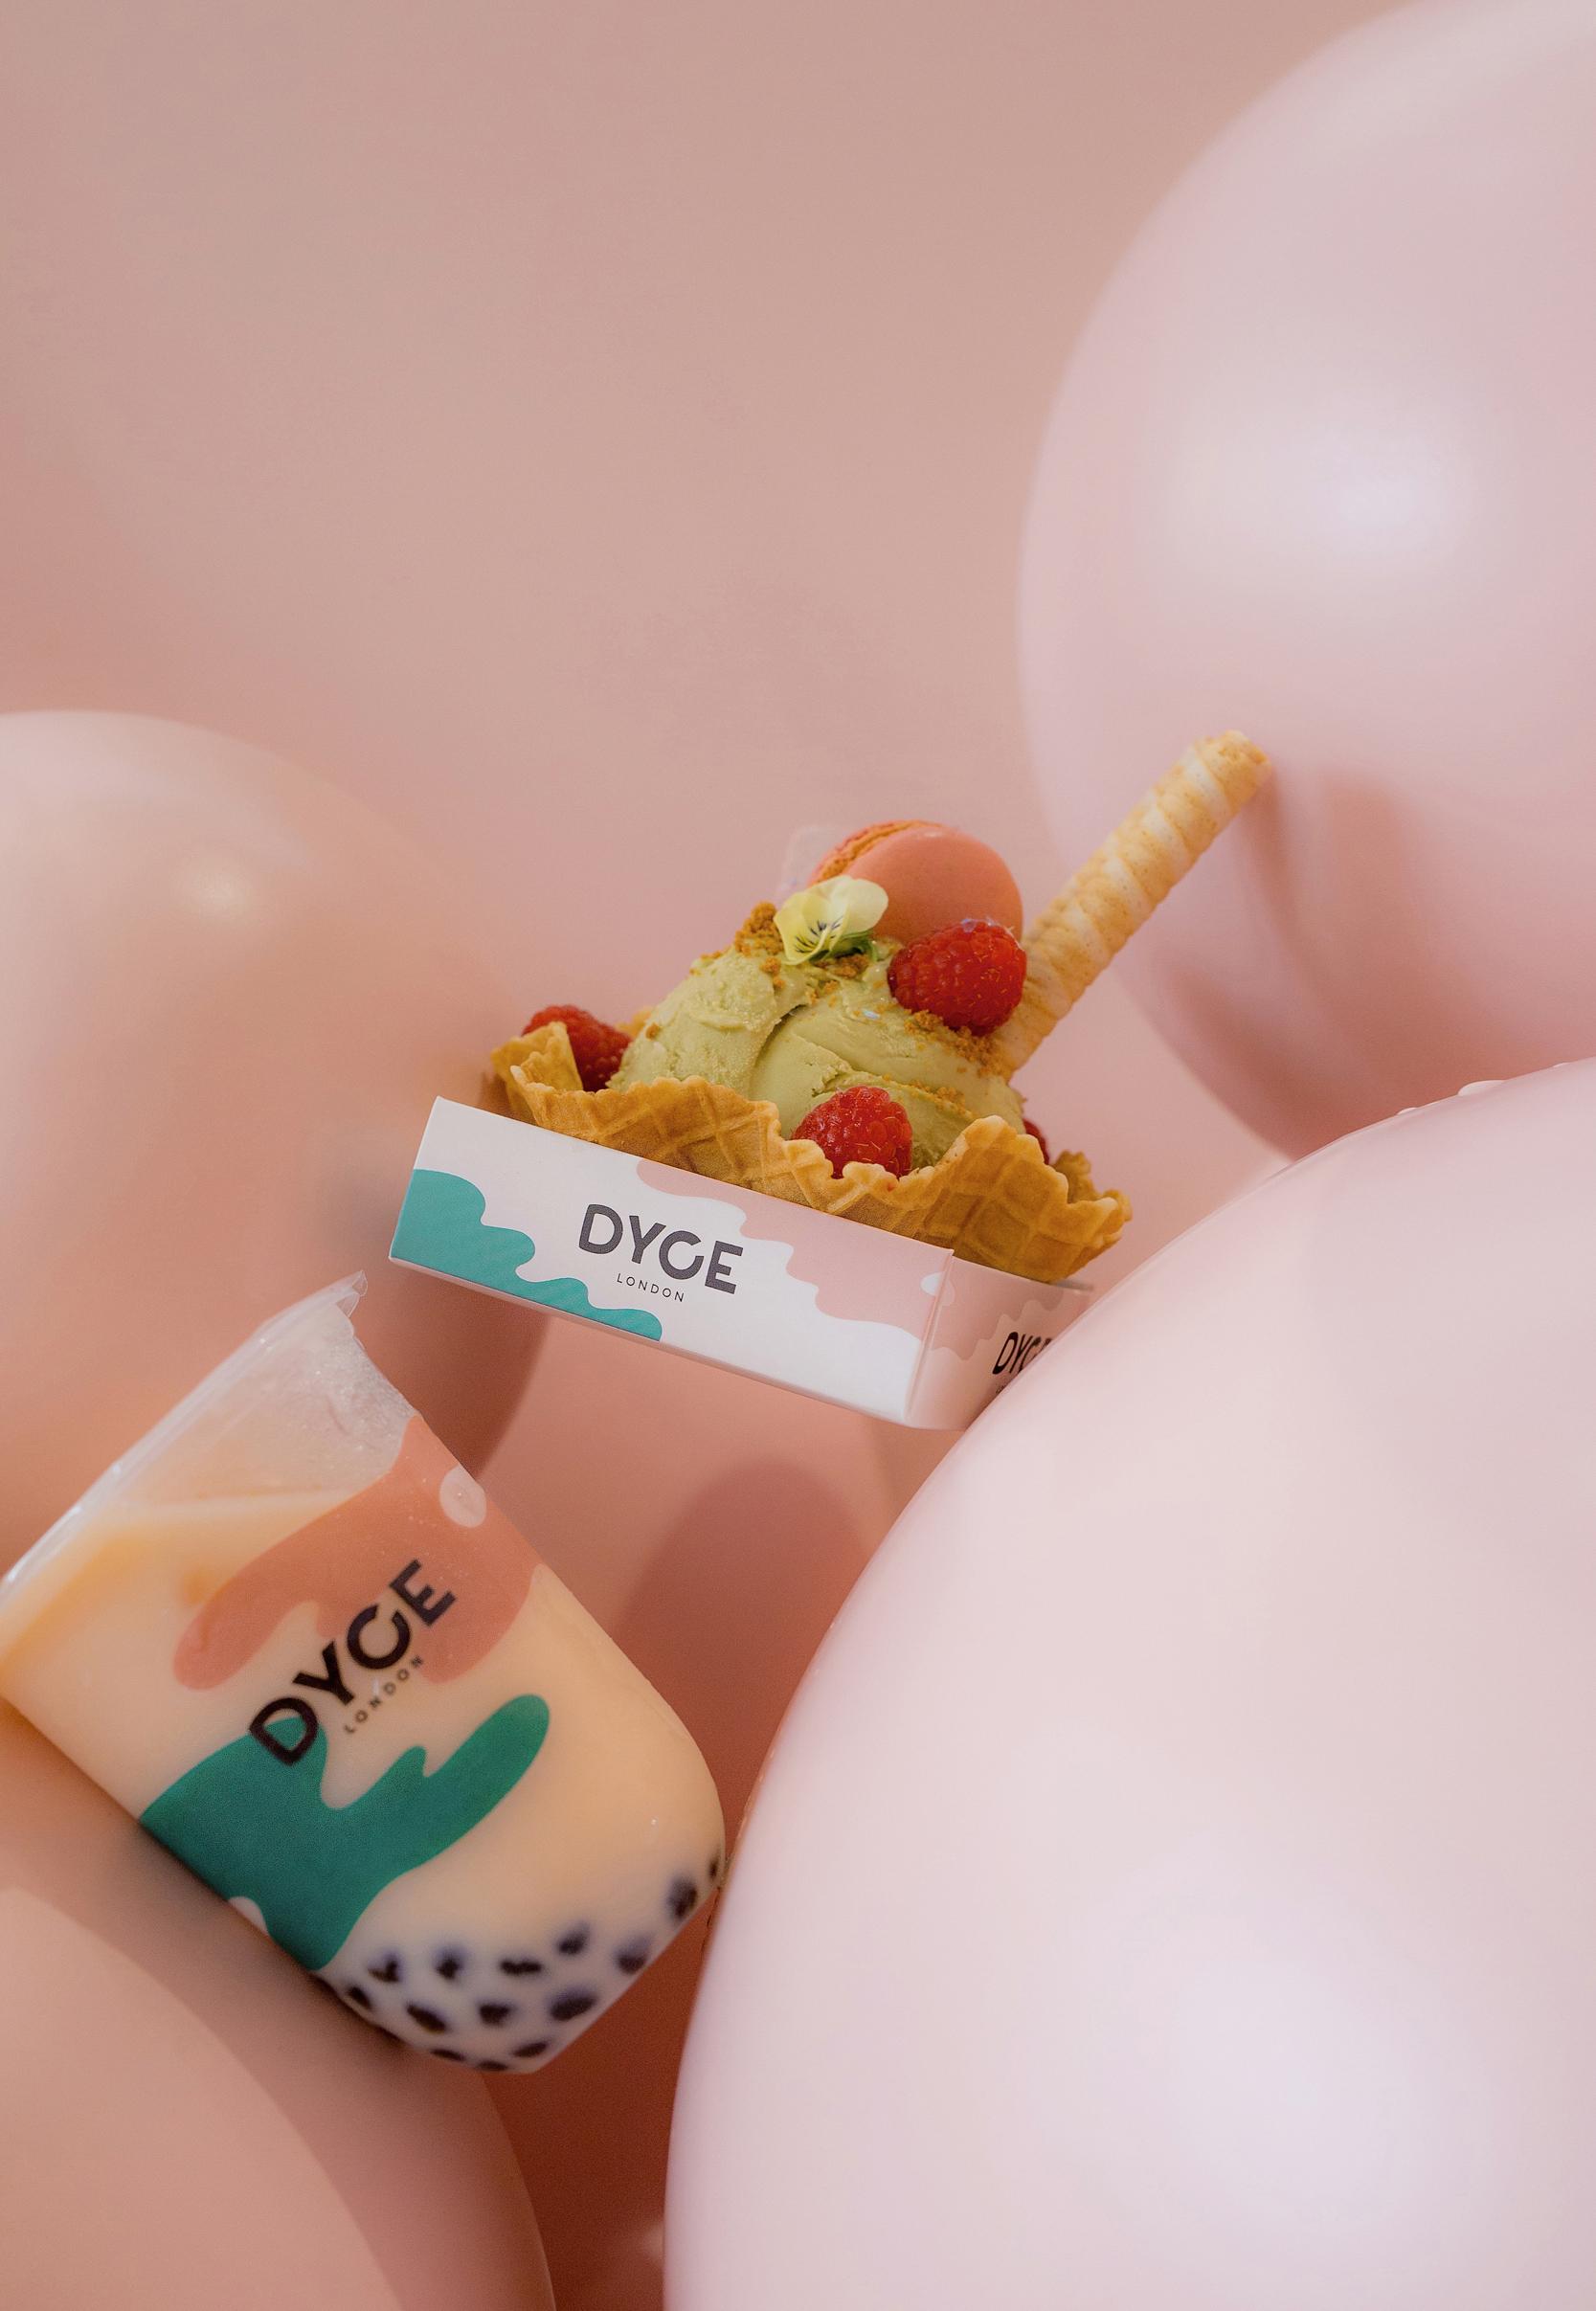 Dyce-03